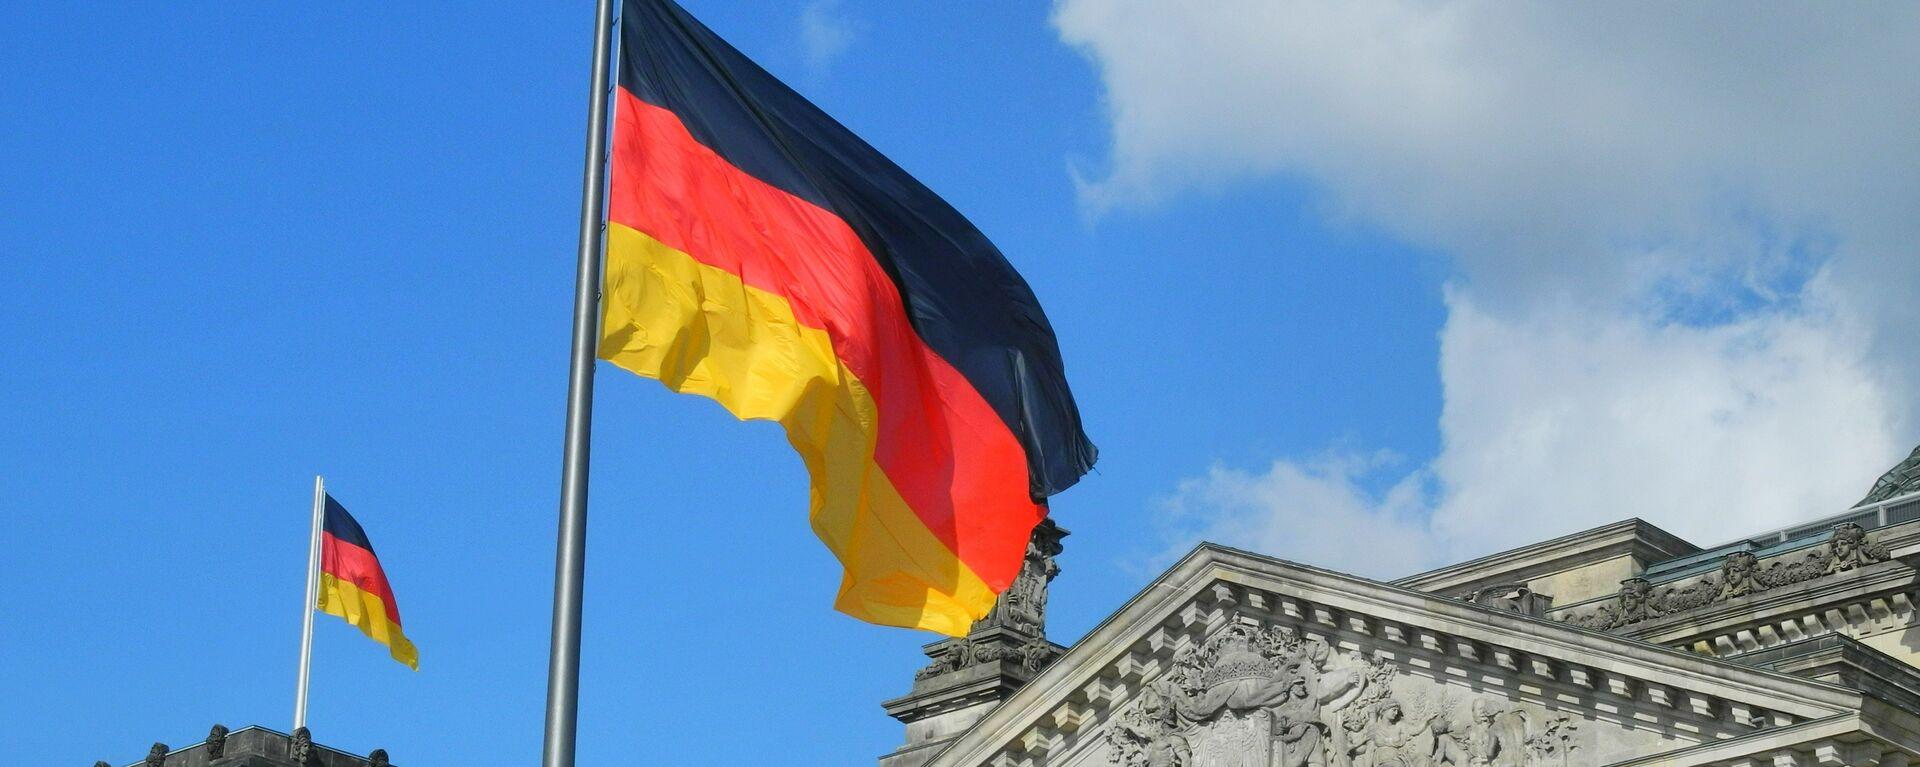 Bandera de Alemania - Sputnik Mundo, 1920, 04.10.2021